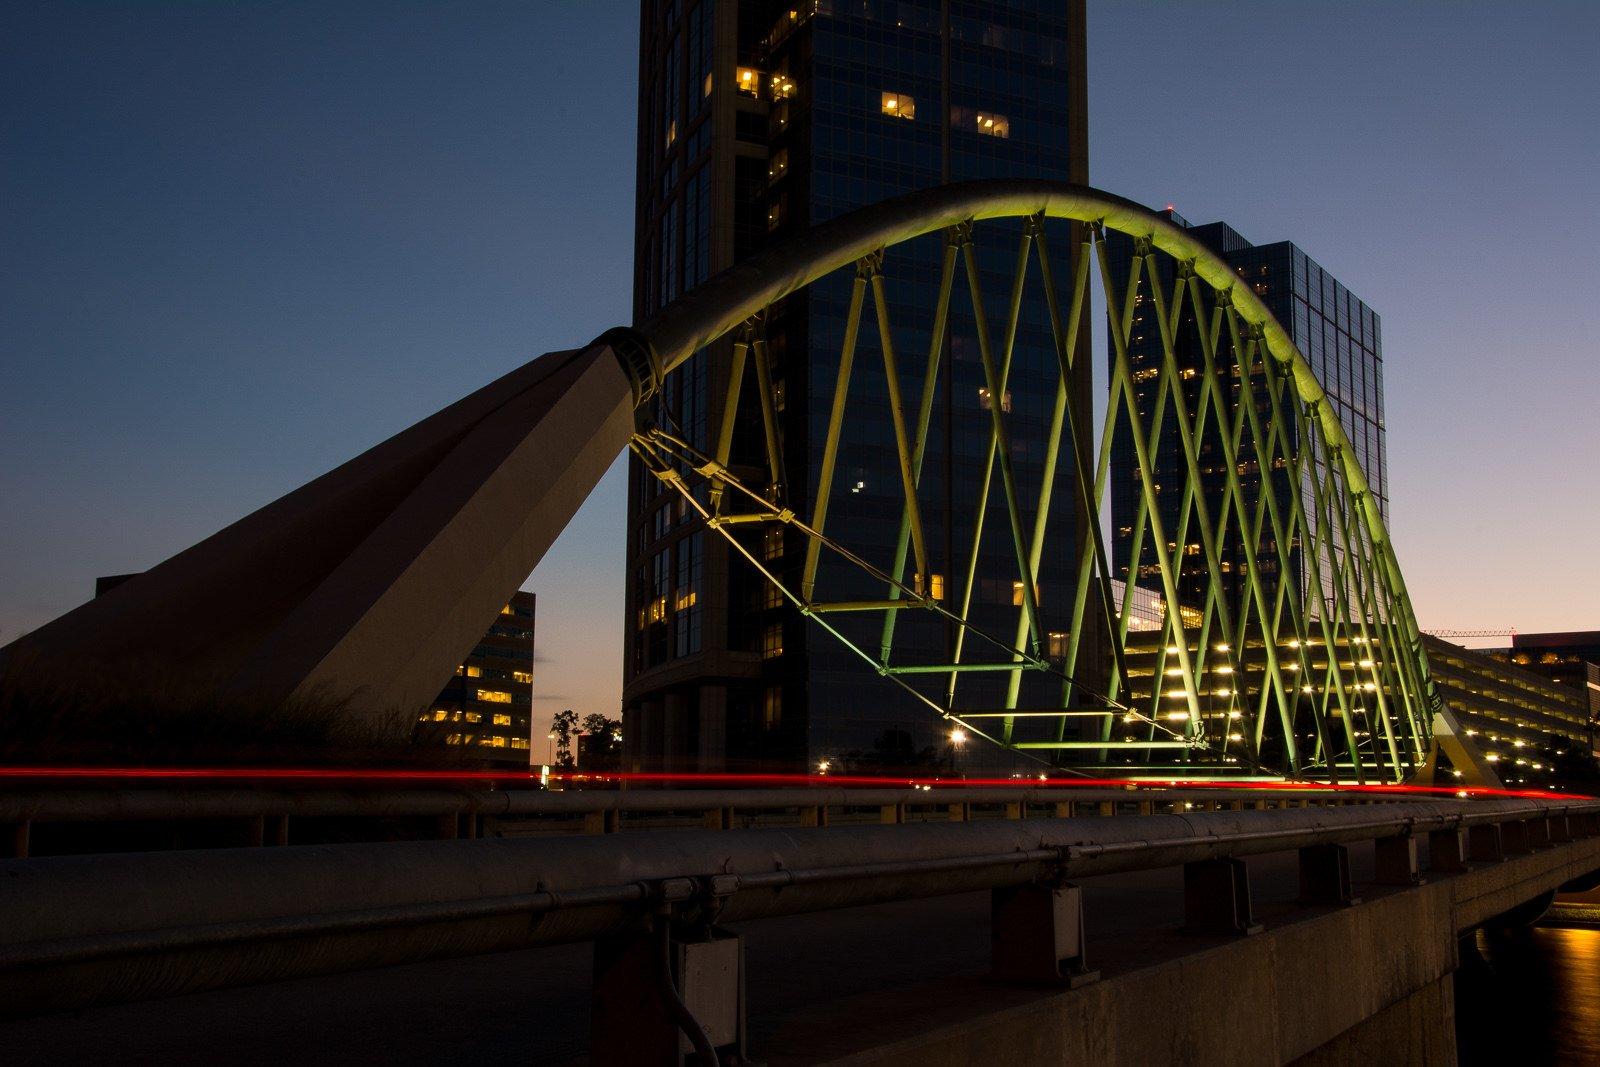 houston architecture bridges cities city texas night towers